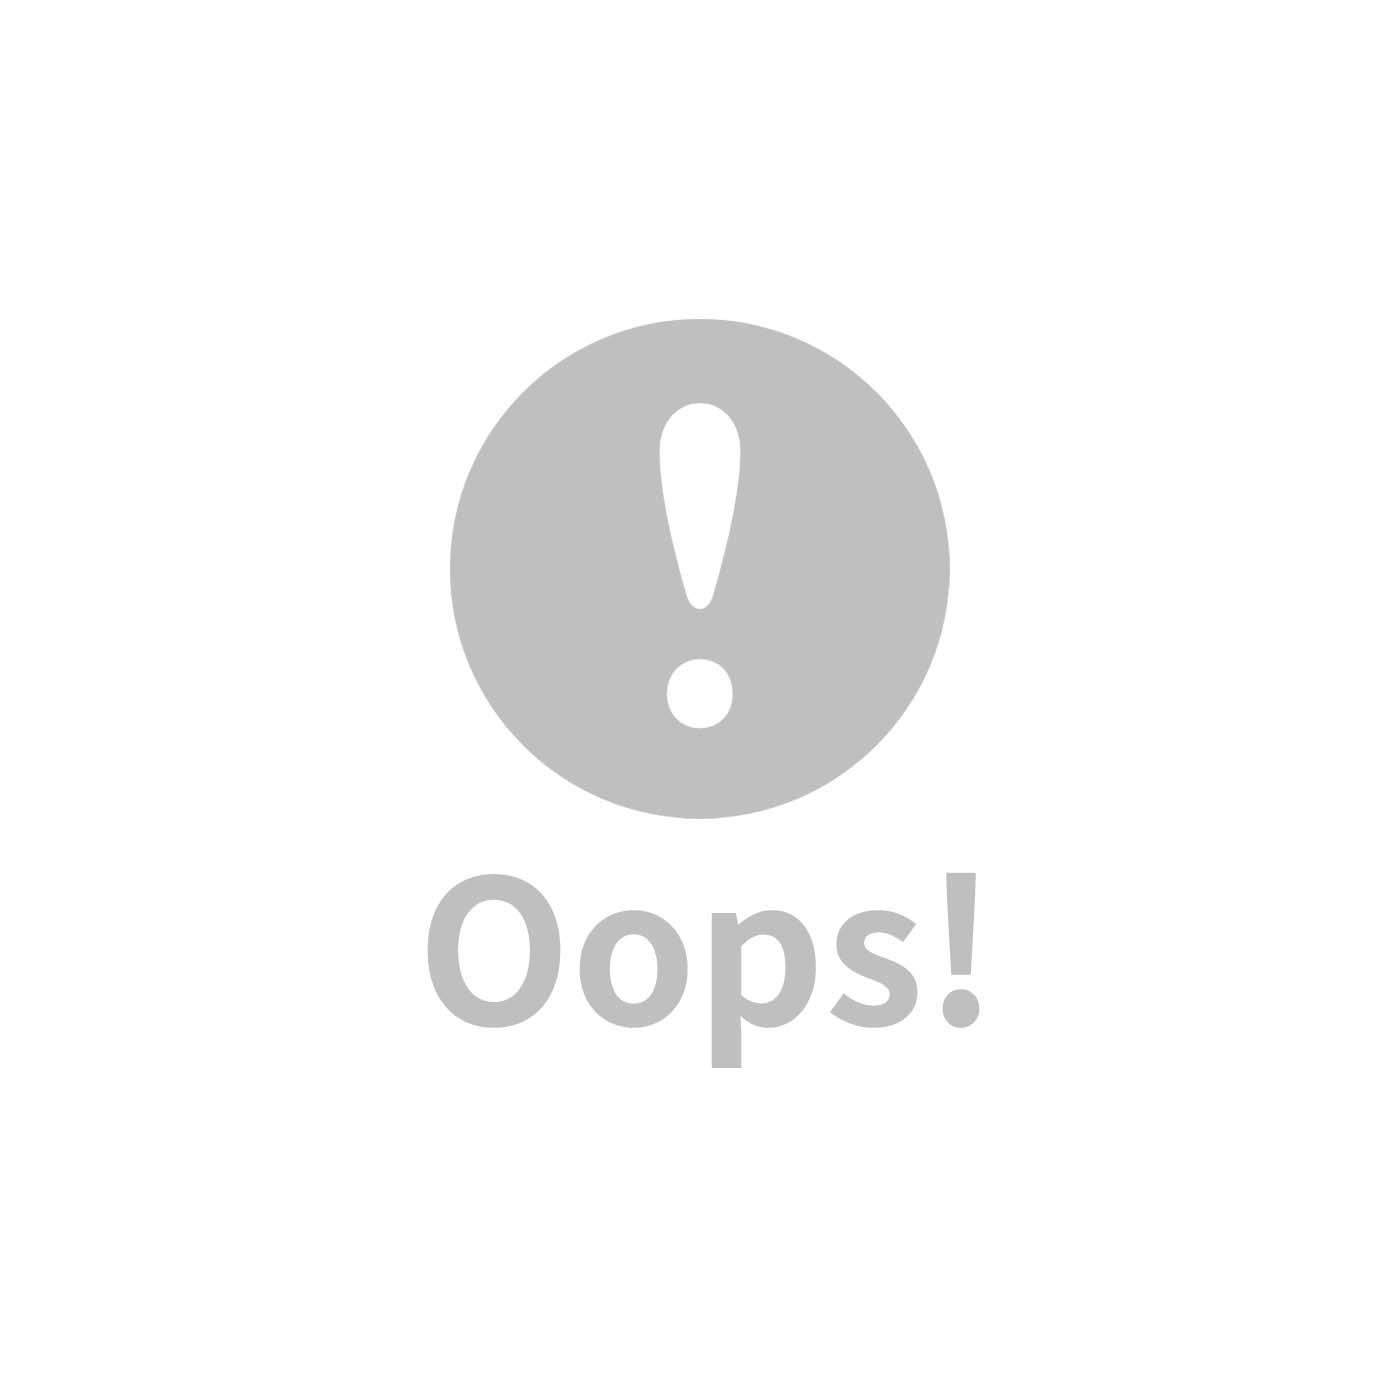 Cuna Tent x Sagepole成長美學小木屋 (3款可選)